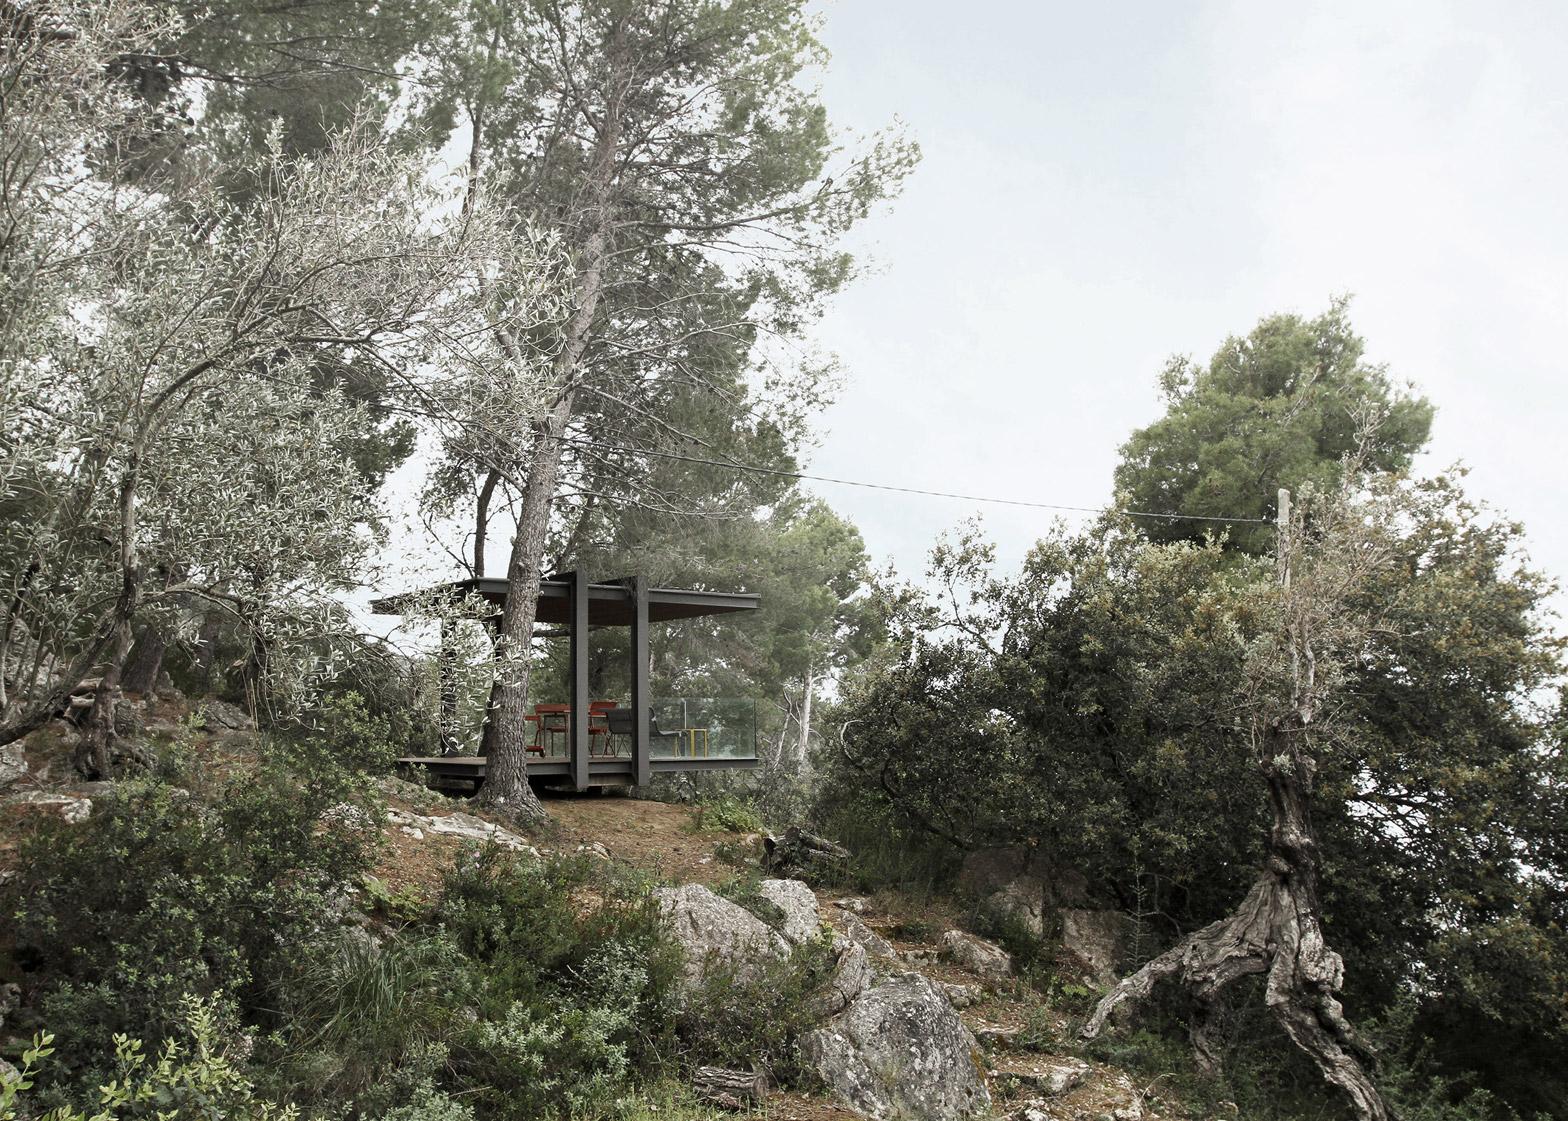 Spain pavilion viewpoint by Philipp Bretschneider of H5 Architekten in Mallorca, Spain